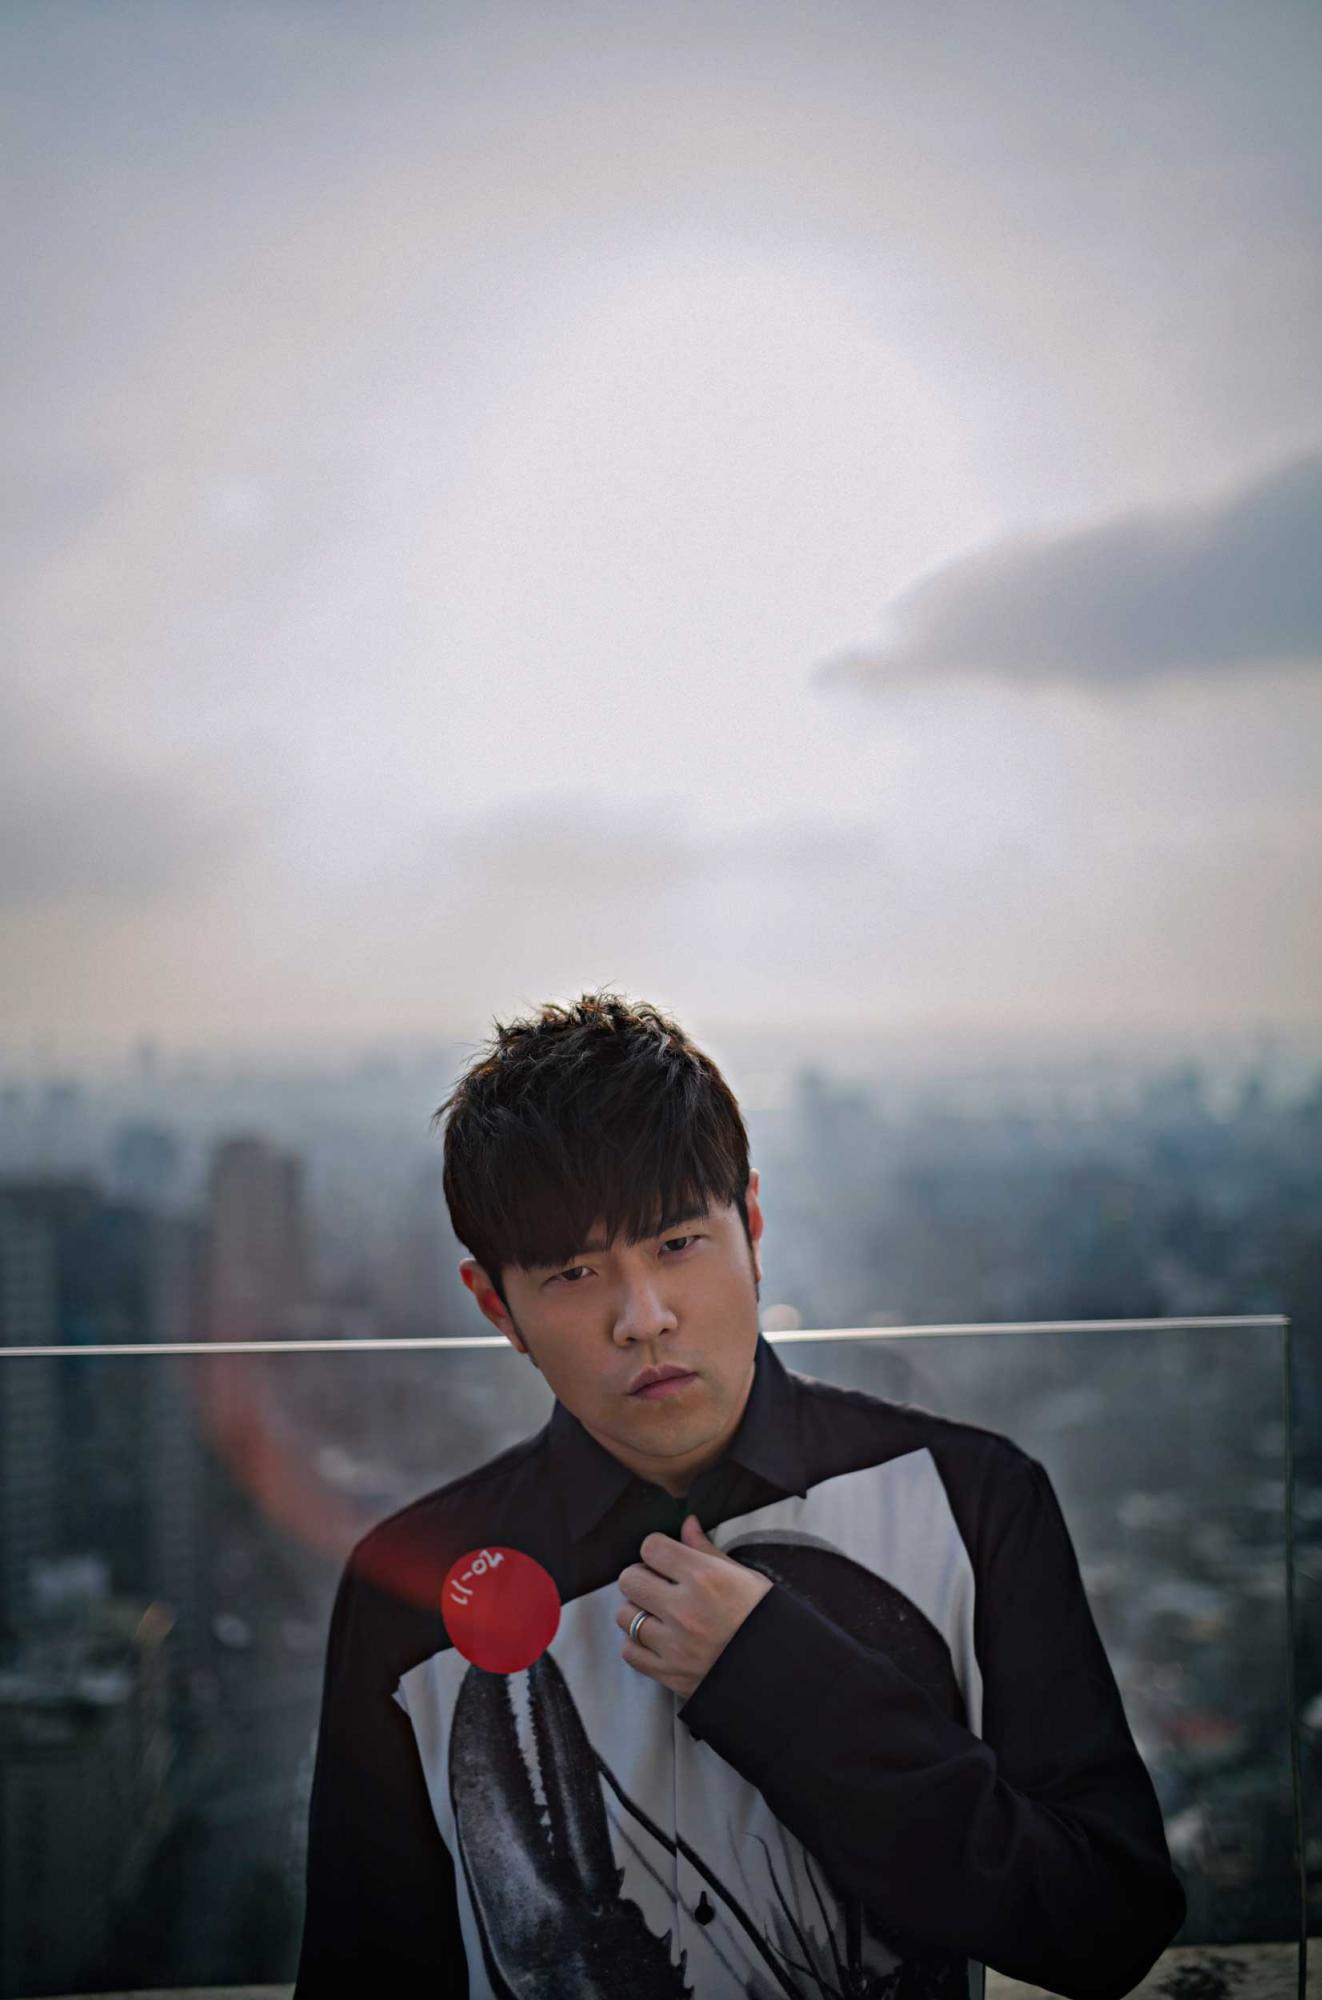 Jay-Chou's-Portrait-(4)-(photo-courtesy-of-Sotheby's-x-Enviseam).jpg